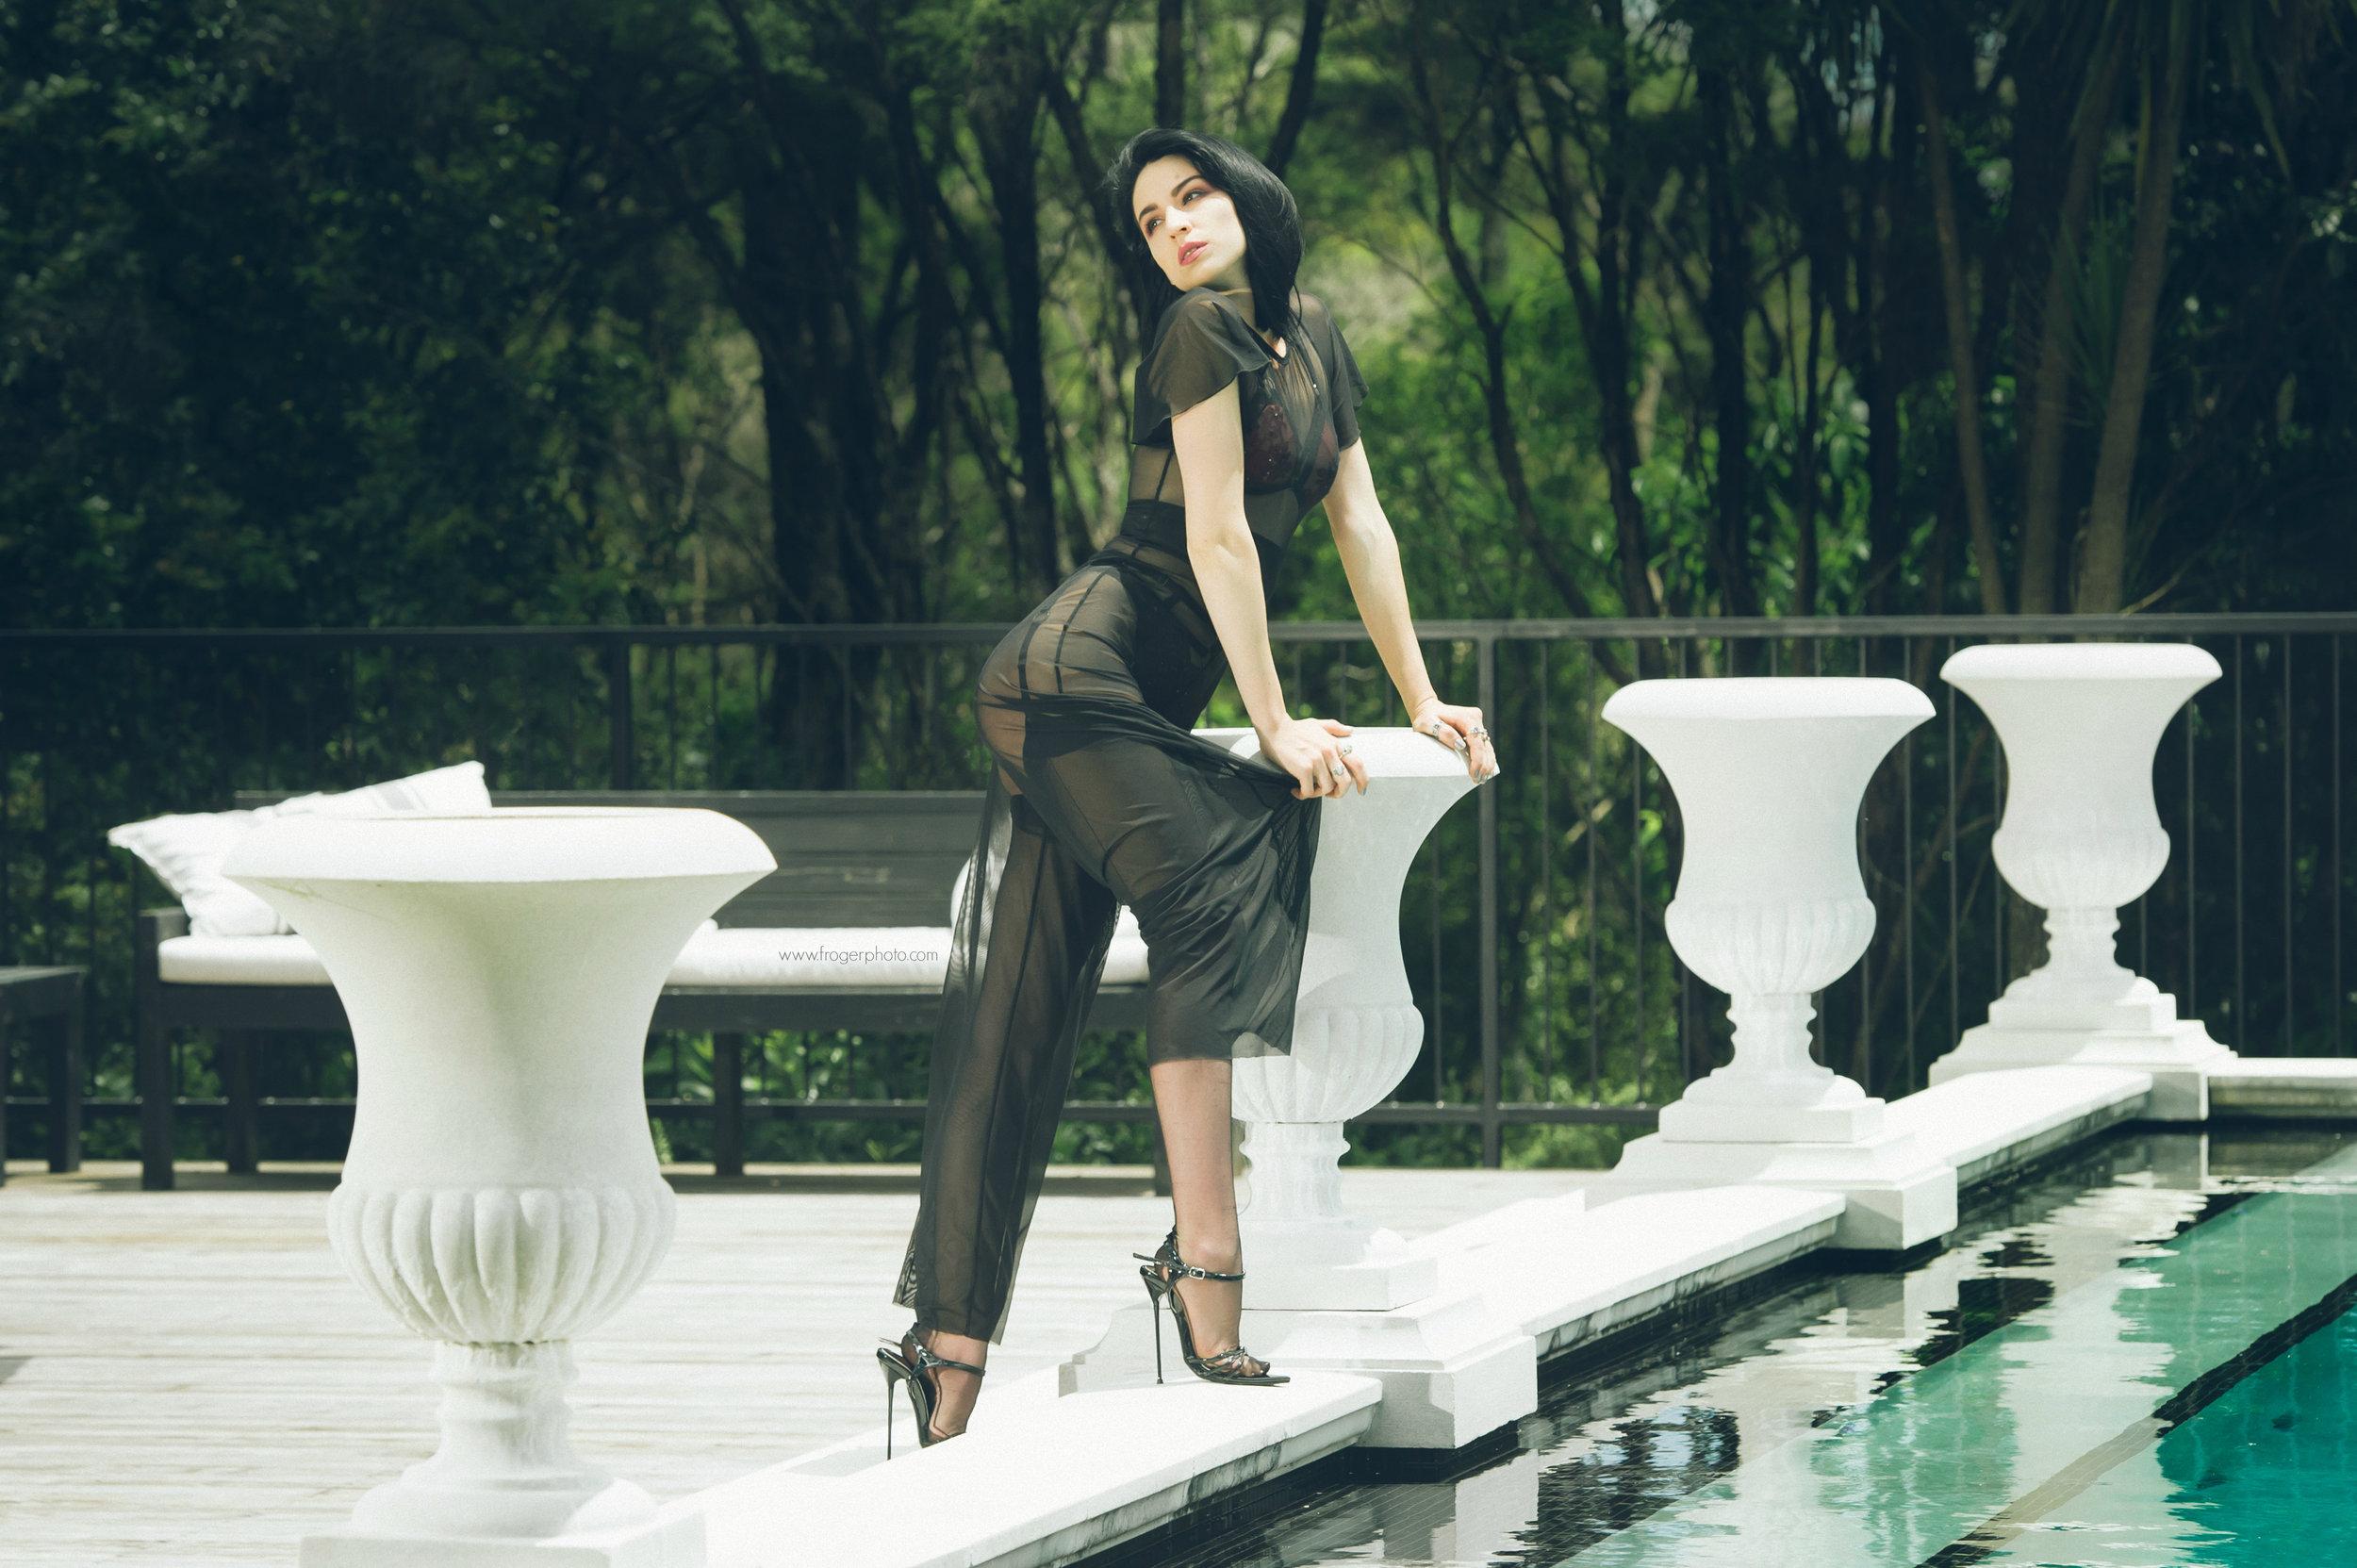 Nicole - St Tropez - Uploaded Dec 10th